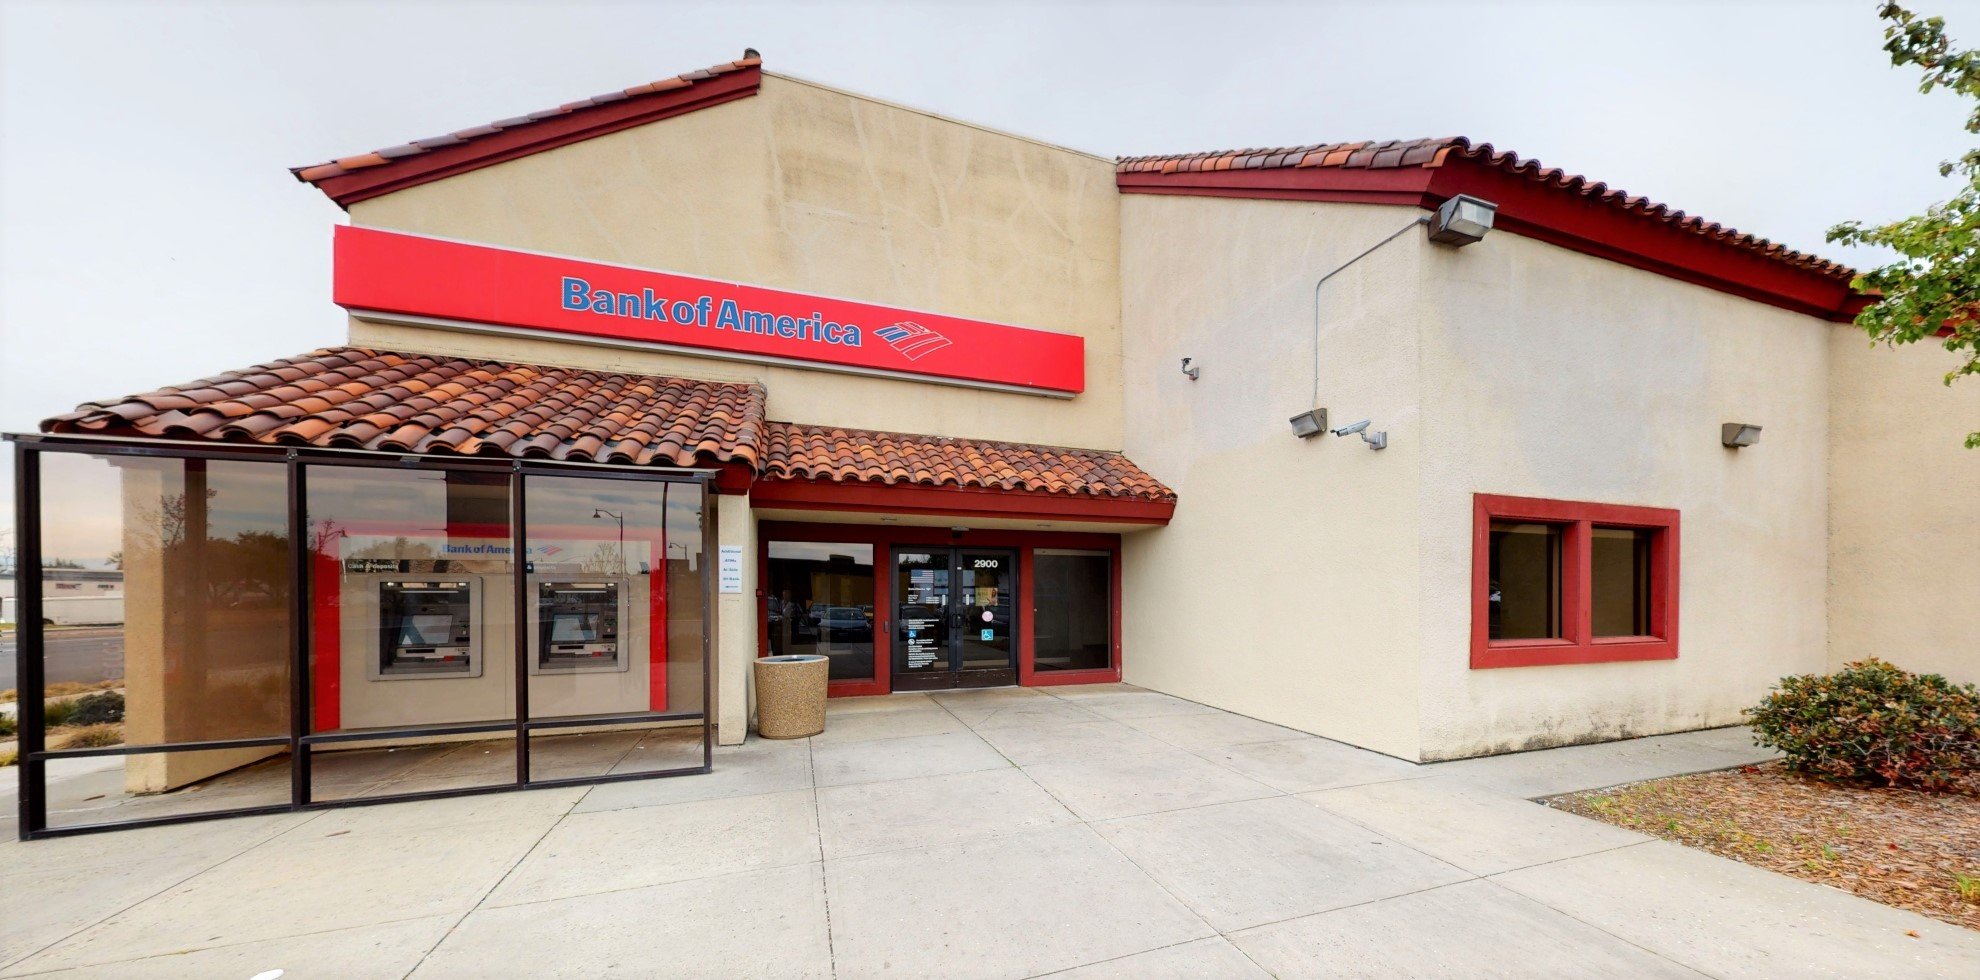 Bank of America financial center with drive-thru ATM | 2900 El Camino Real, Santa Clara, CA 95051